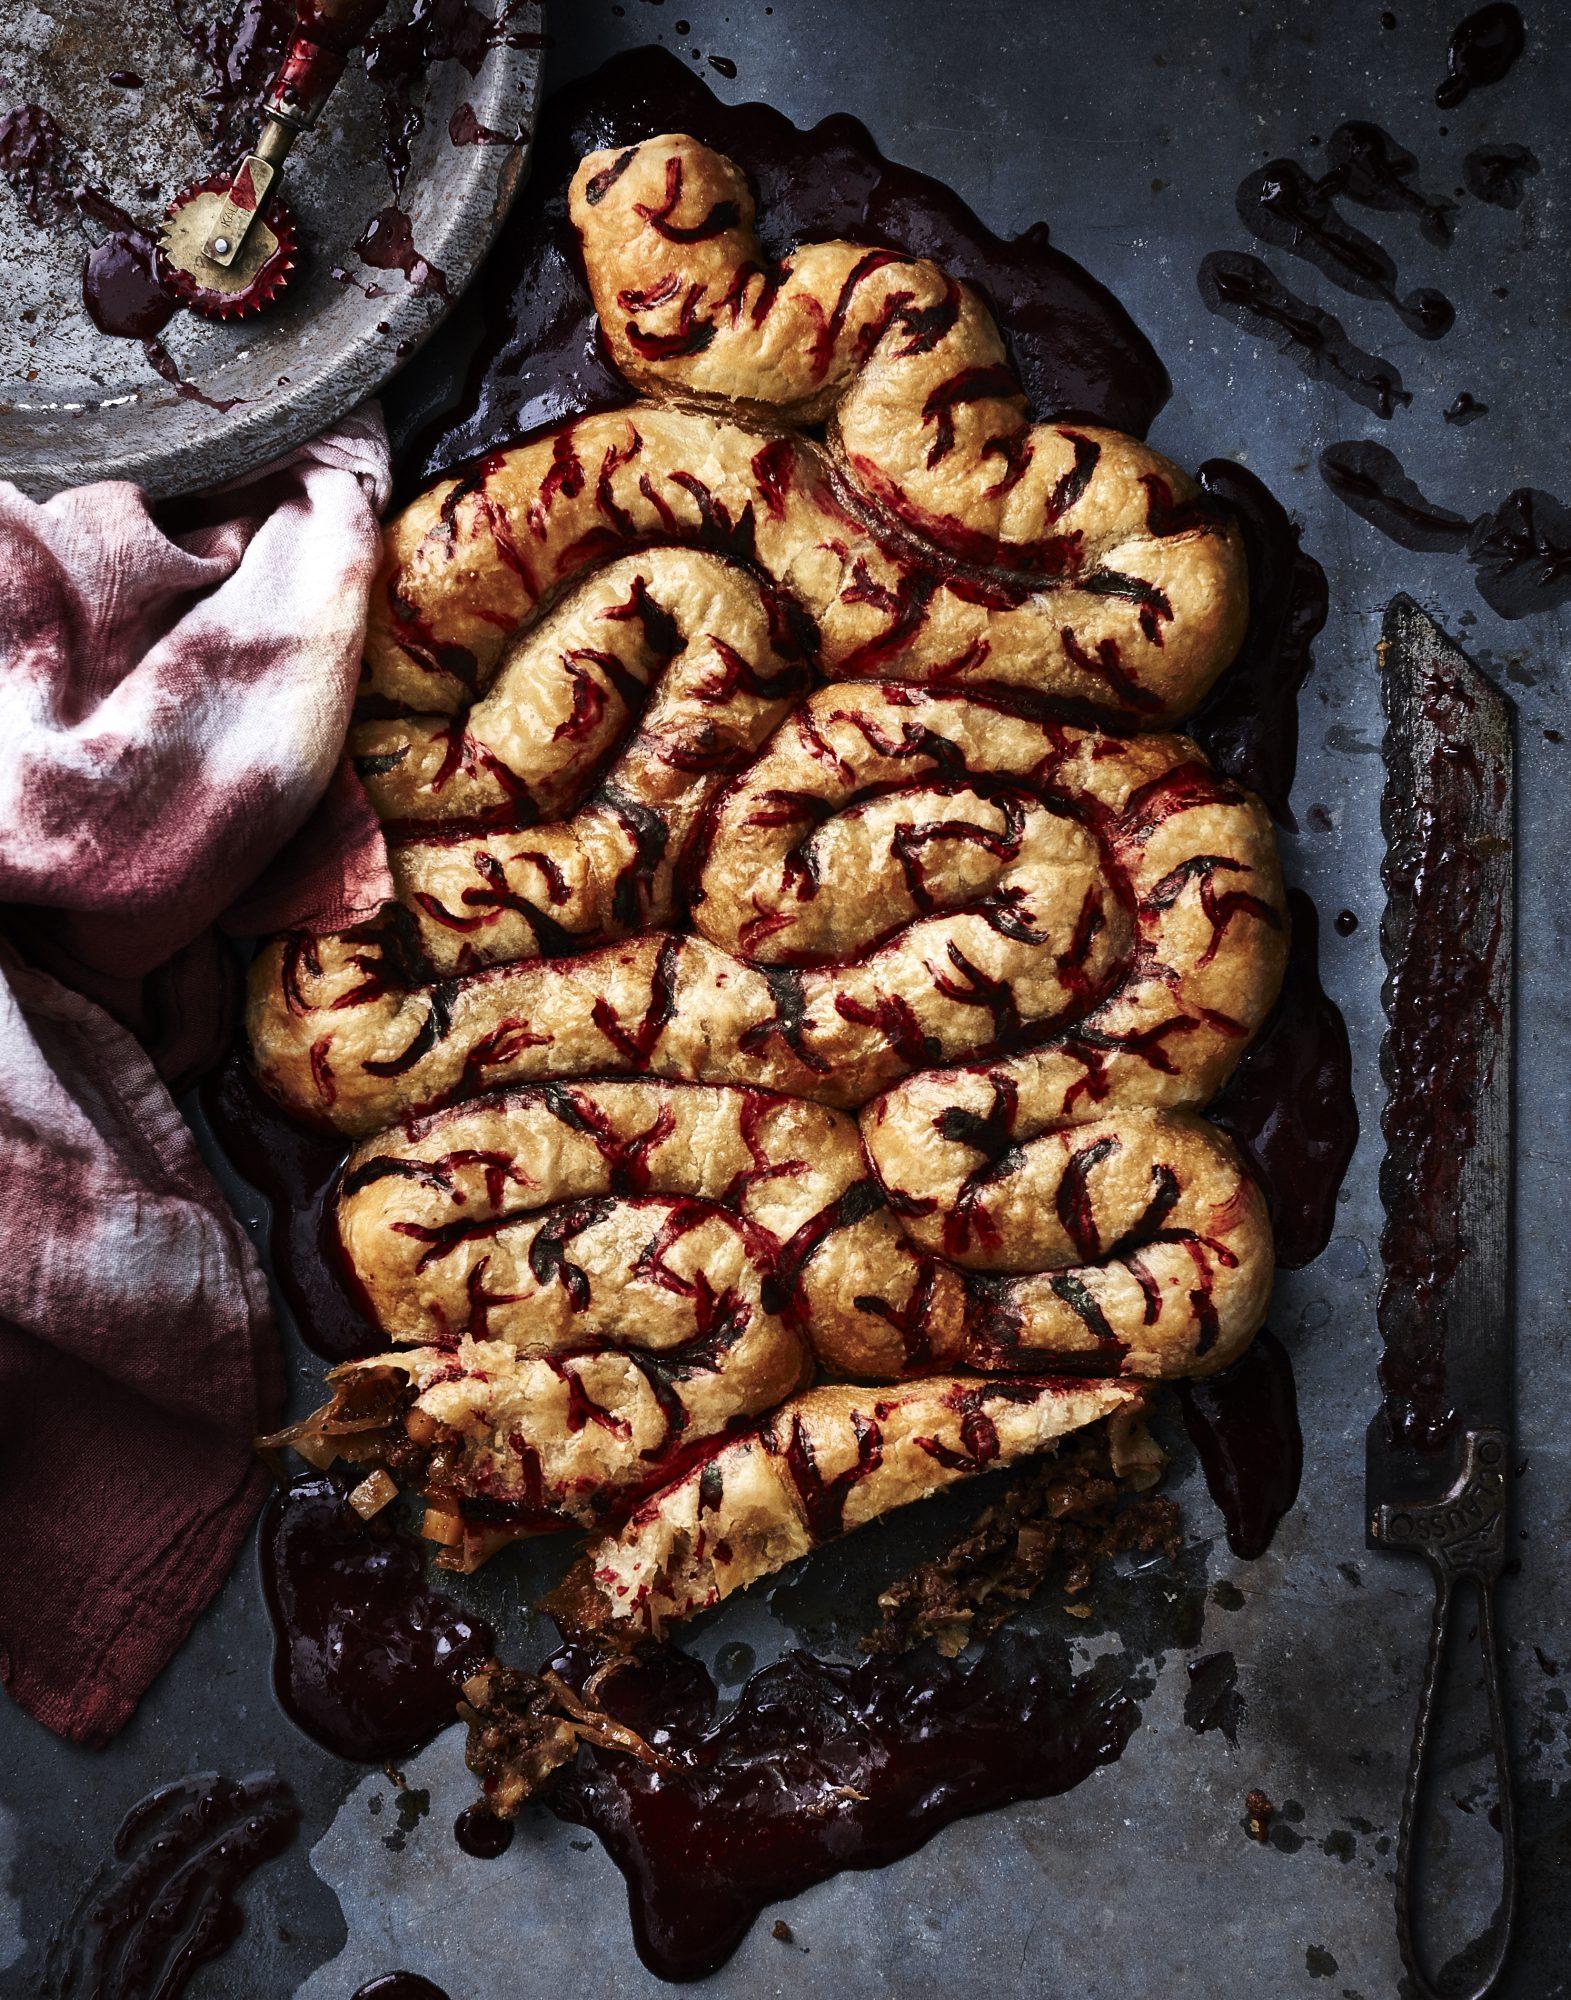 Chorizo and Caramelized Onion Stuffed Intestines image